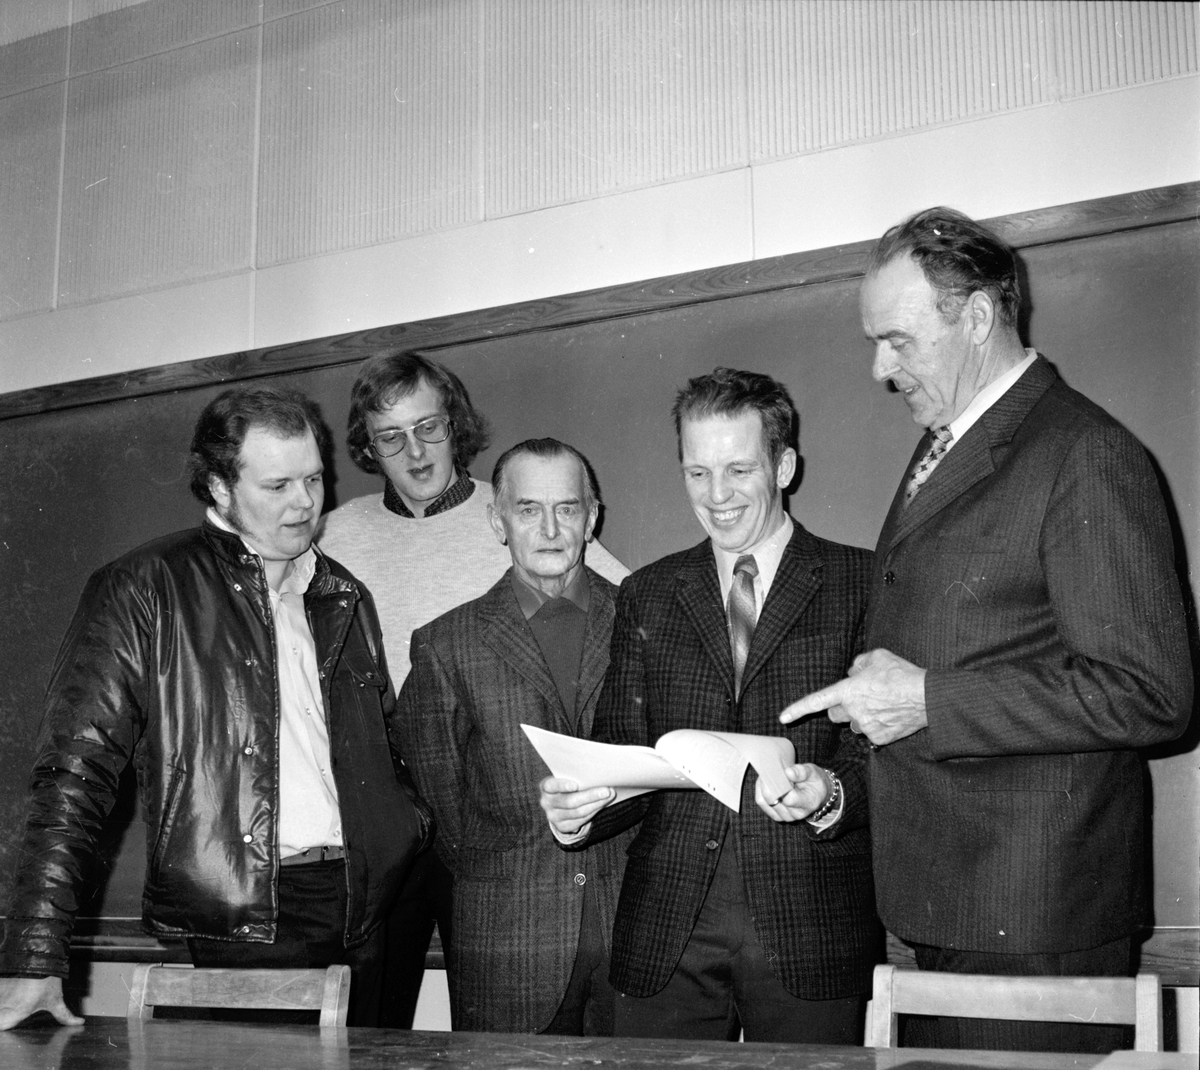 Nytorp, Svinintressenter, Bl.a. Gunnar Larsson, Mars 1973